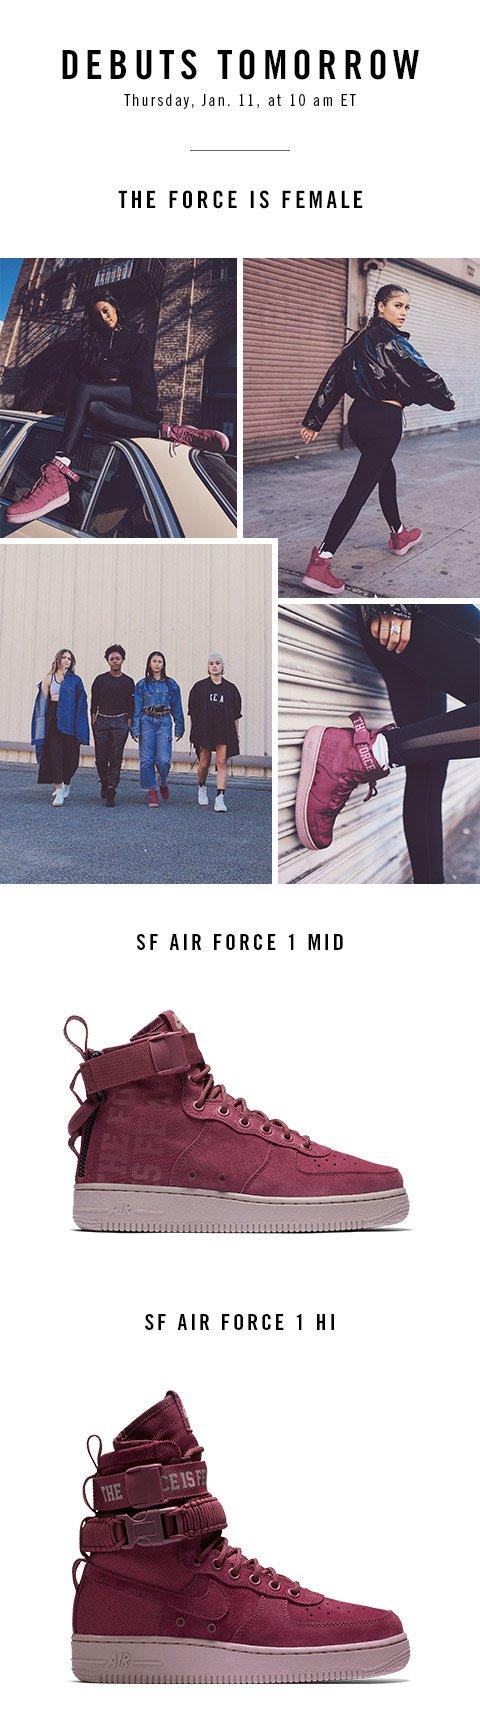 Six:02: Tomorrow! Nike SF Air Force 1 In Vintage Wine & Milled